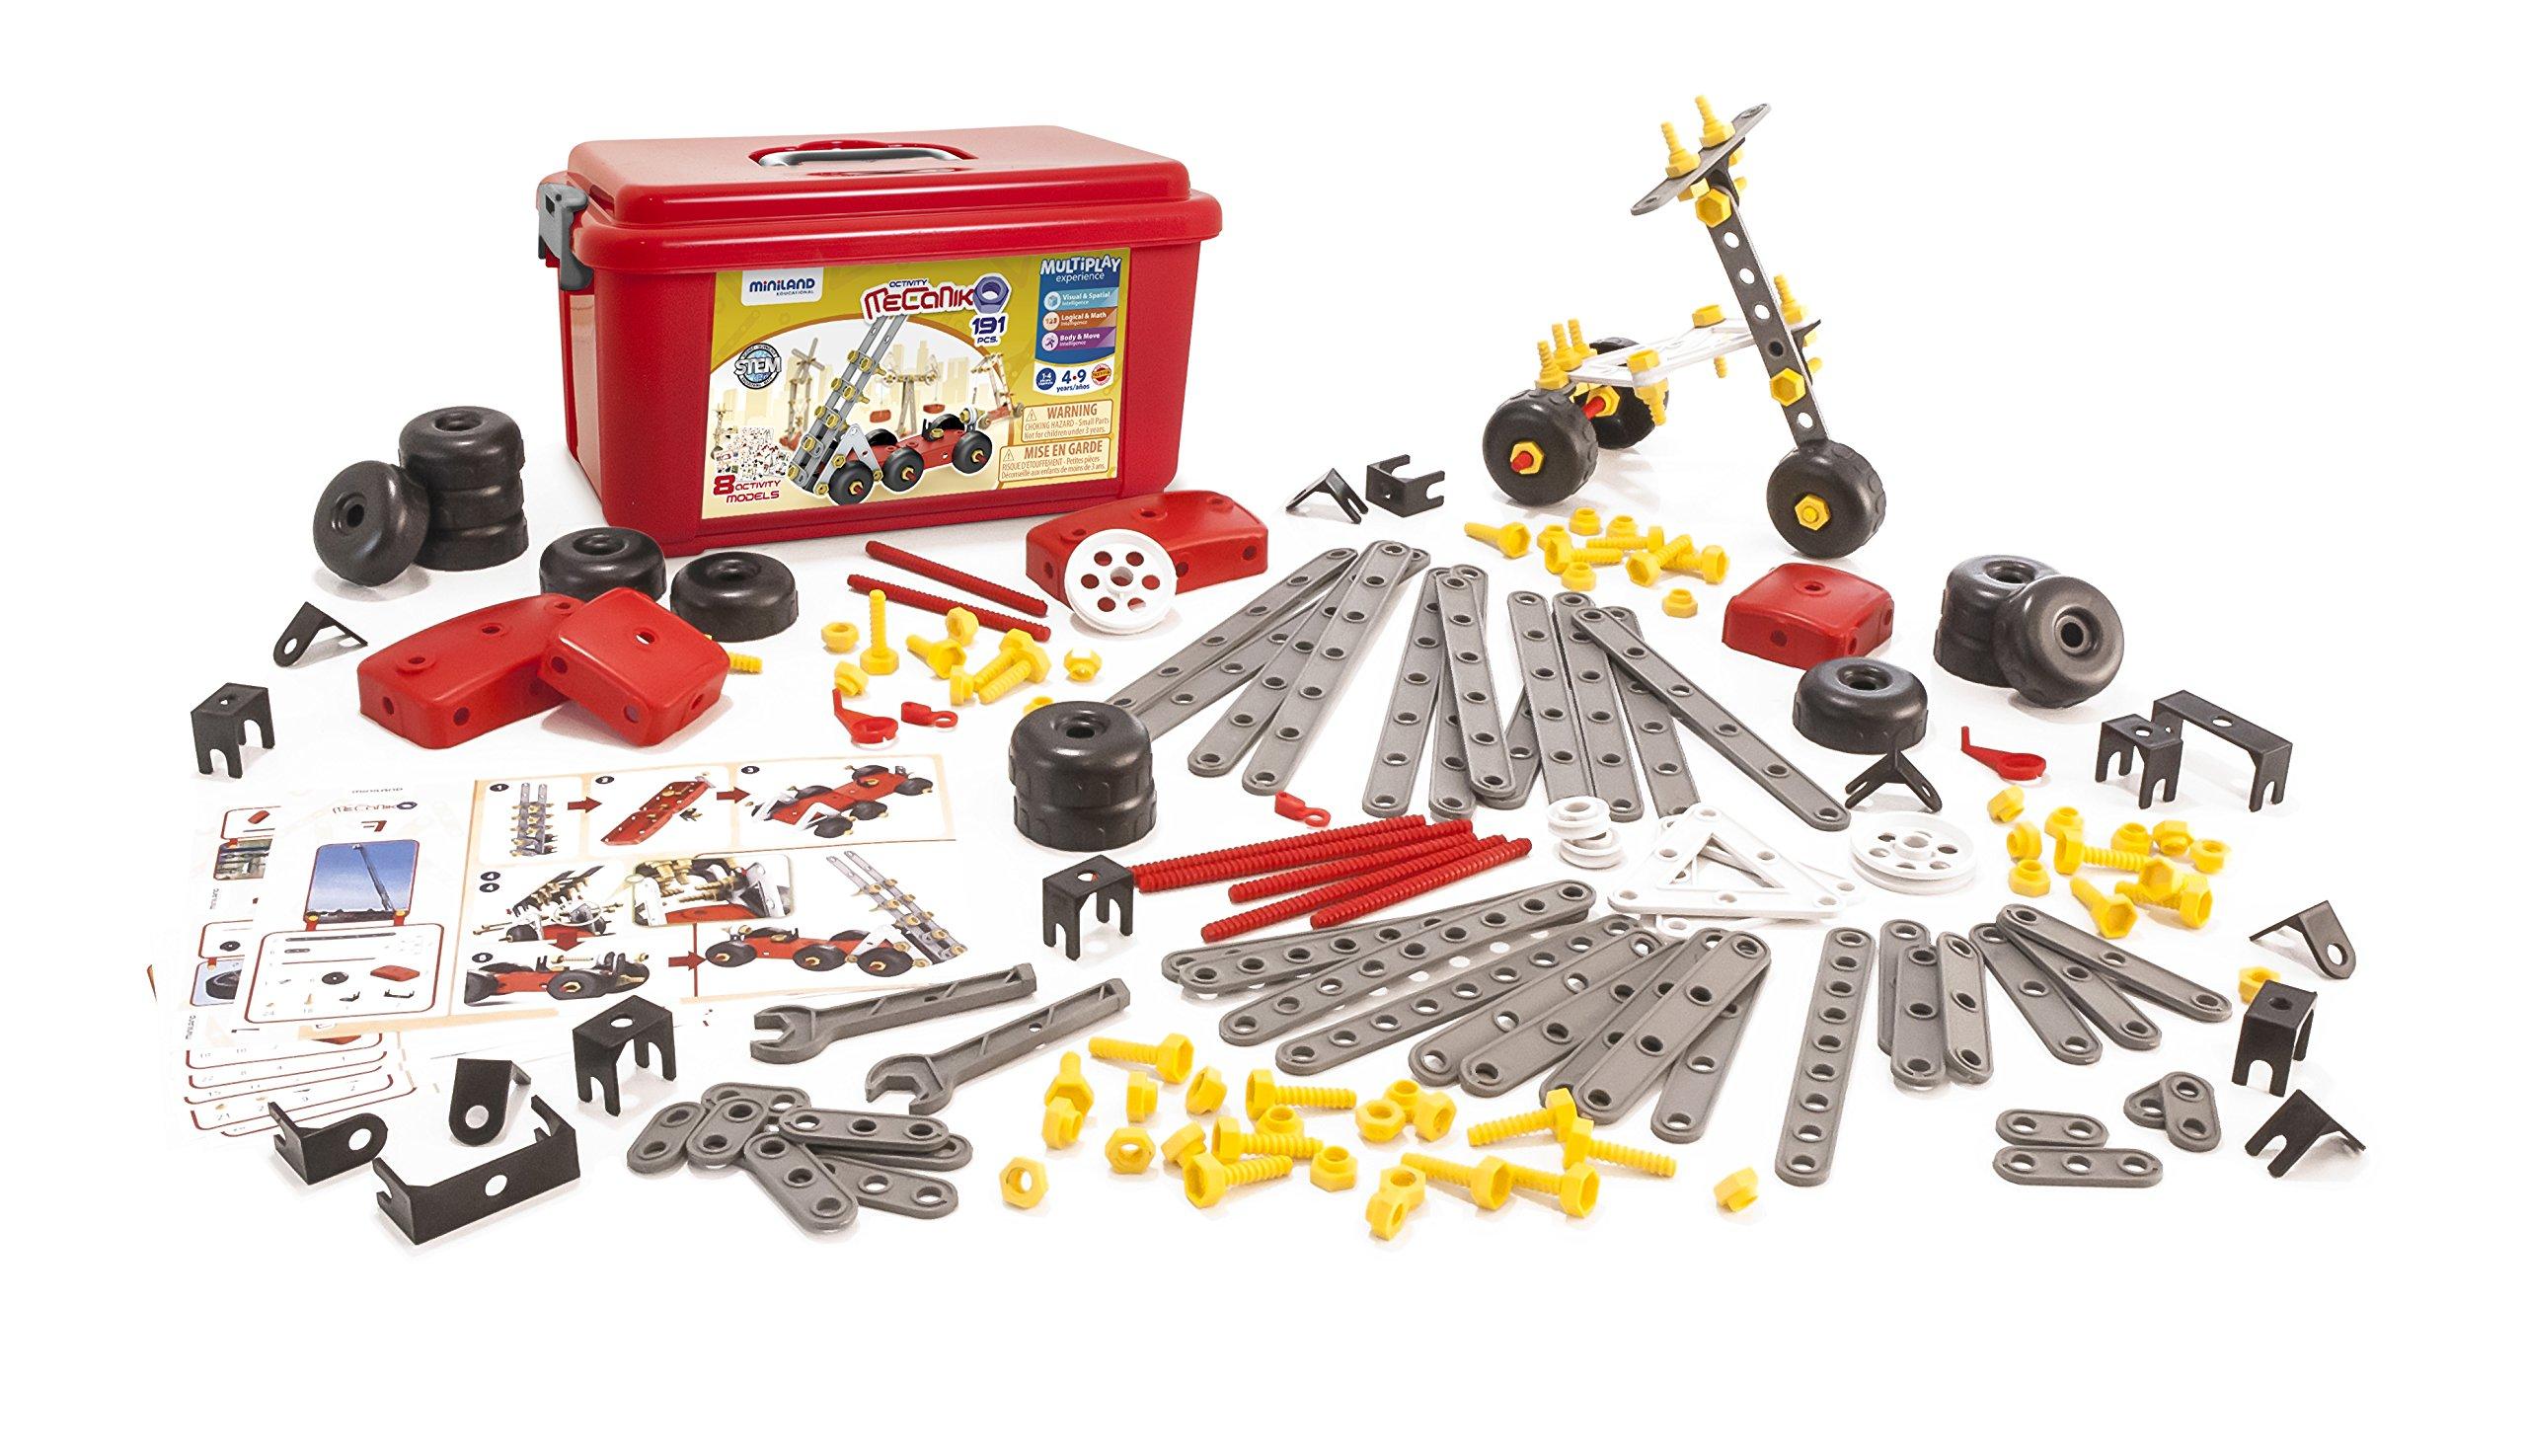 Miniland Activity Mecaniko Builder Set, 191 Pieces, Red/Yellow/Charcoal